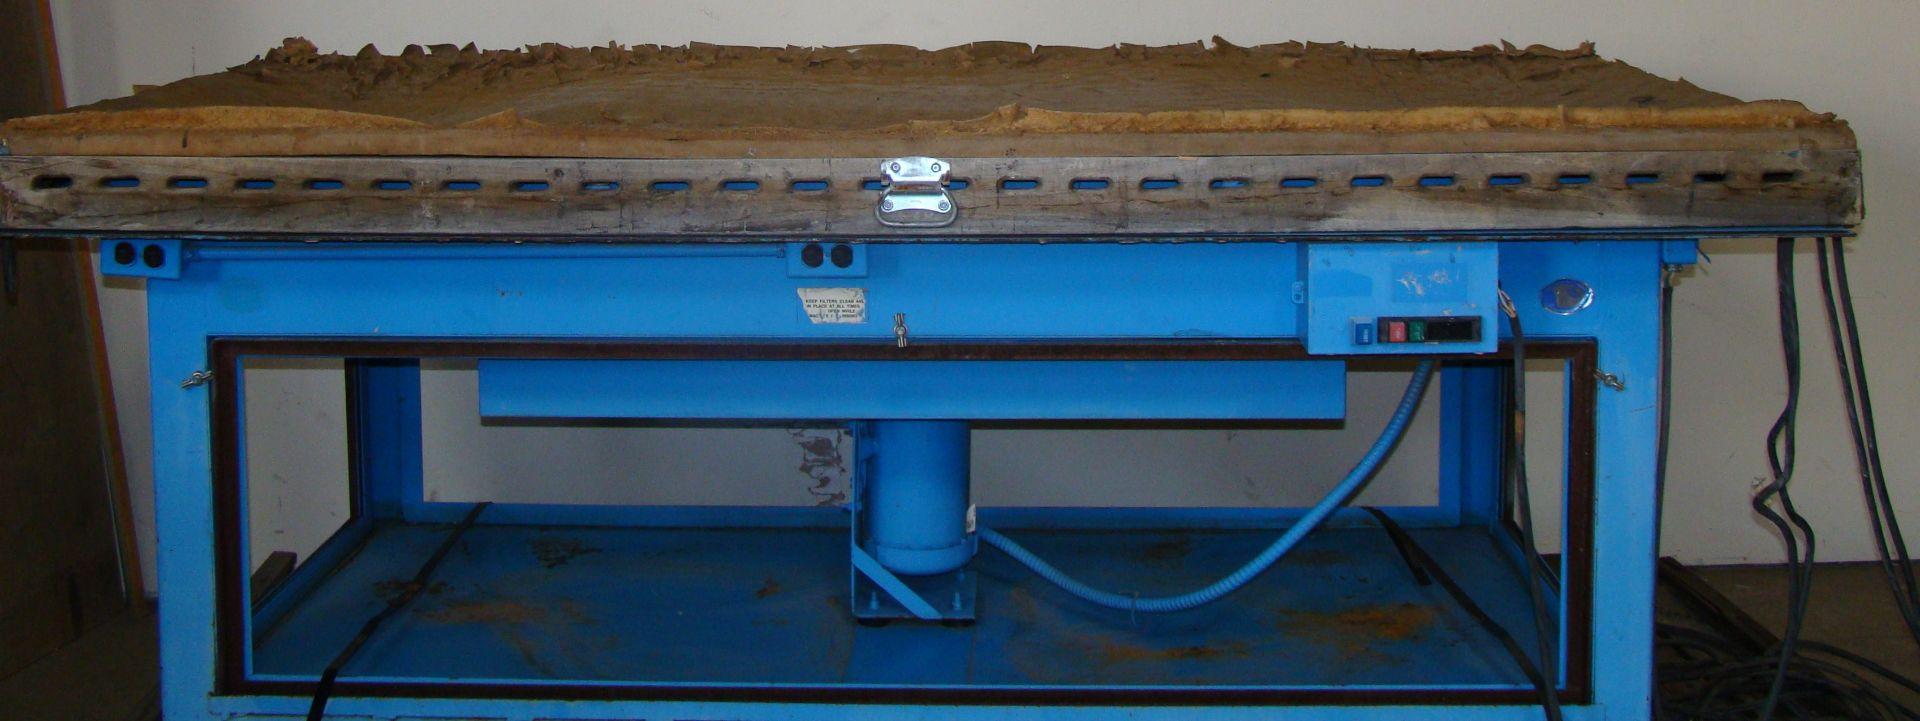 Lot 53 - Denray Downdraft Wood Sanding Machine 4' x 8' Table Model 9600, 2HP 230/460 Volt 3PH